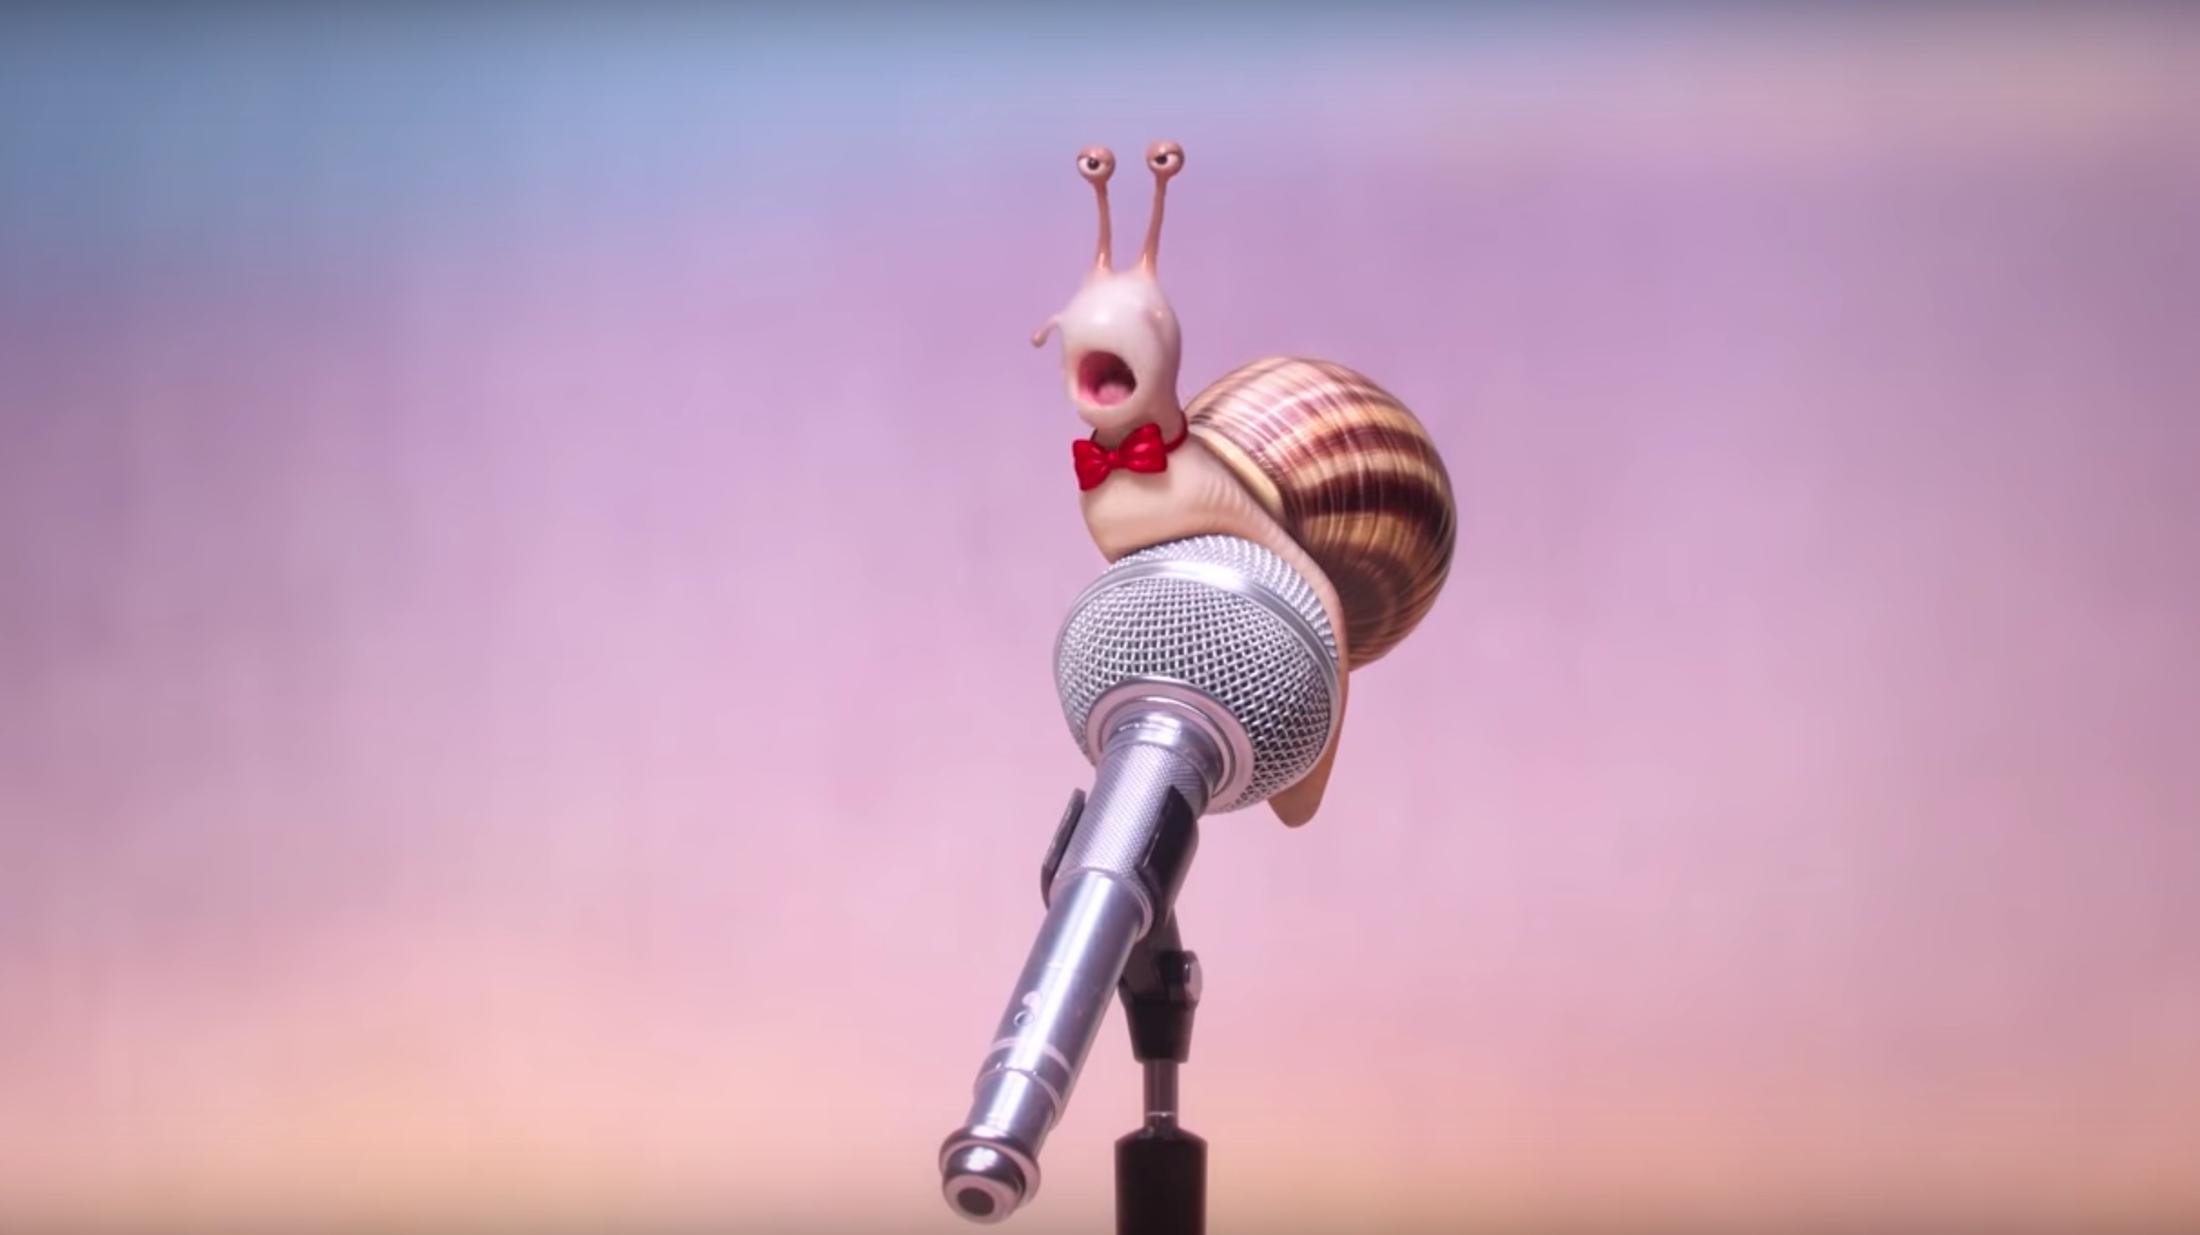 Sing: lumachina cantante